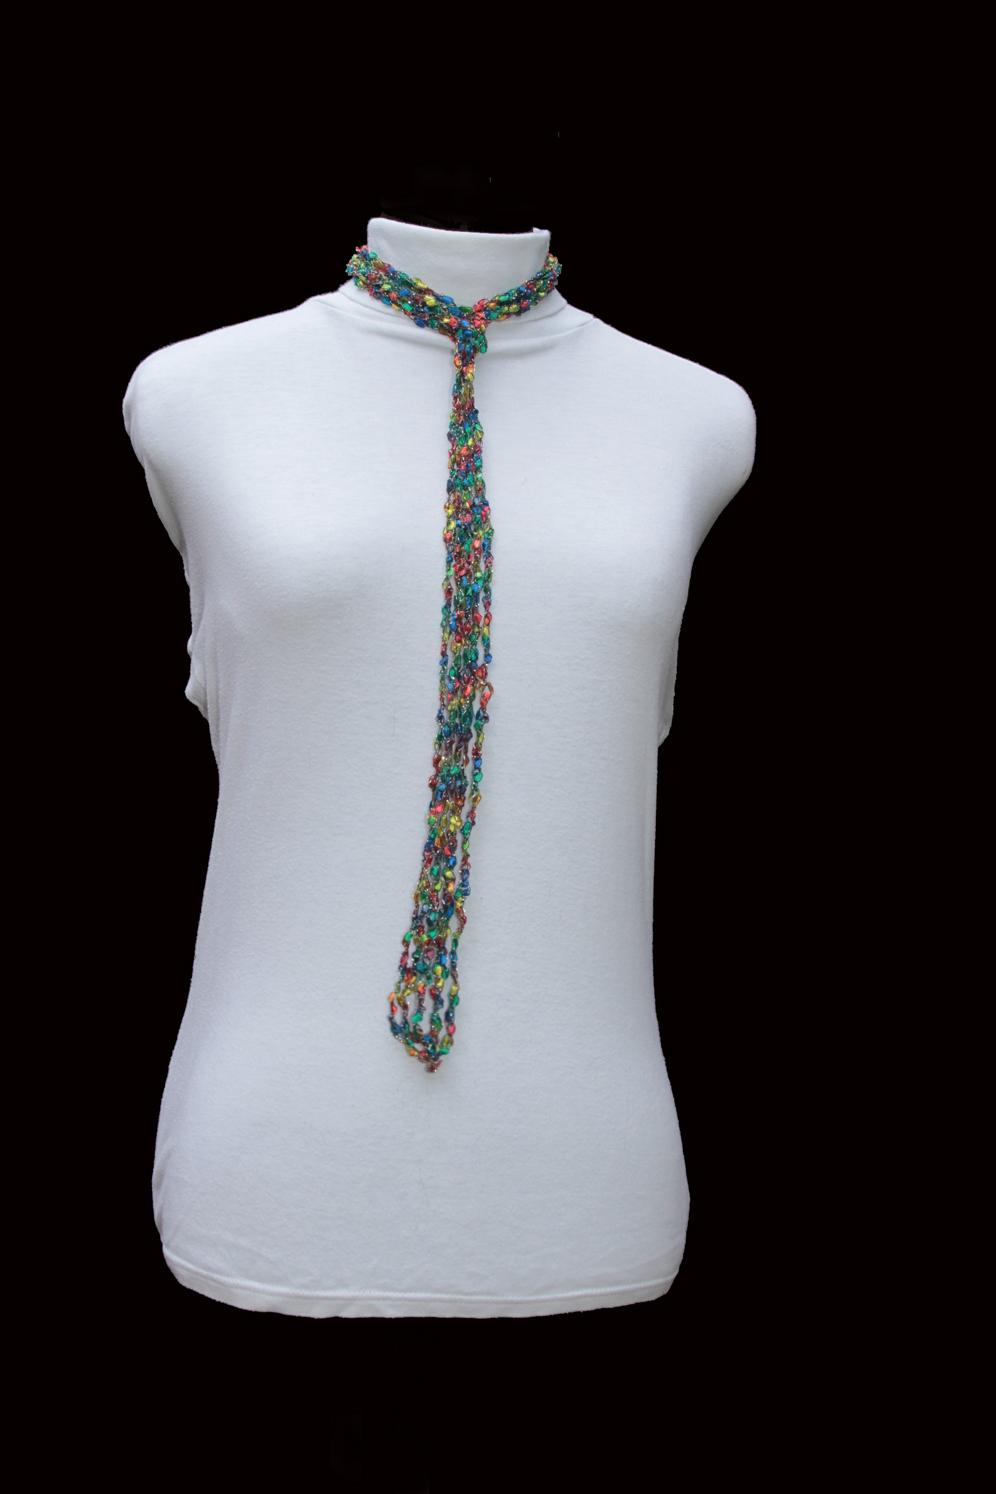 Craft Illusion Handmade Necklaces